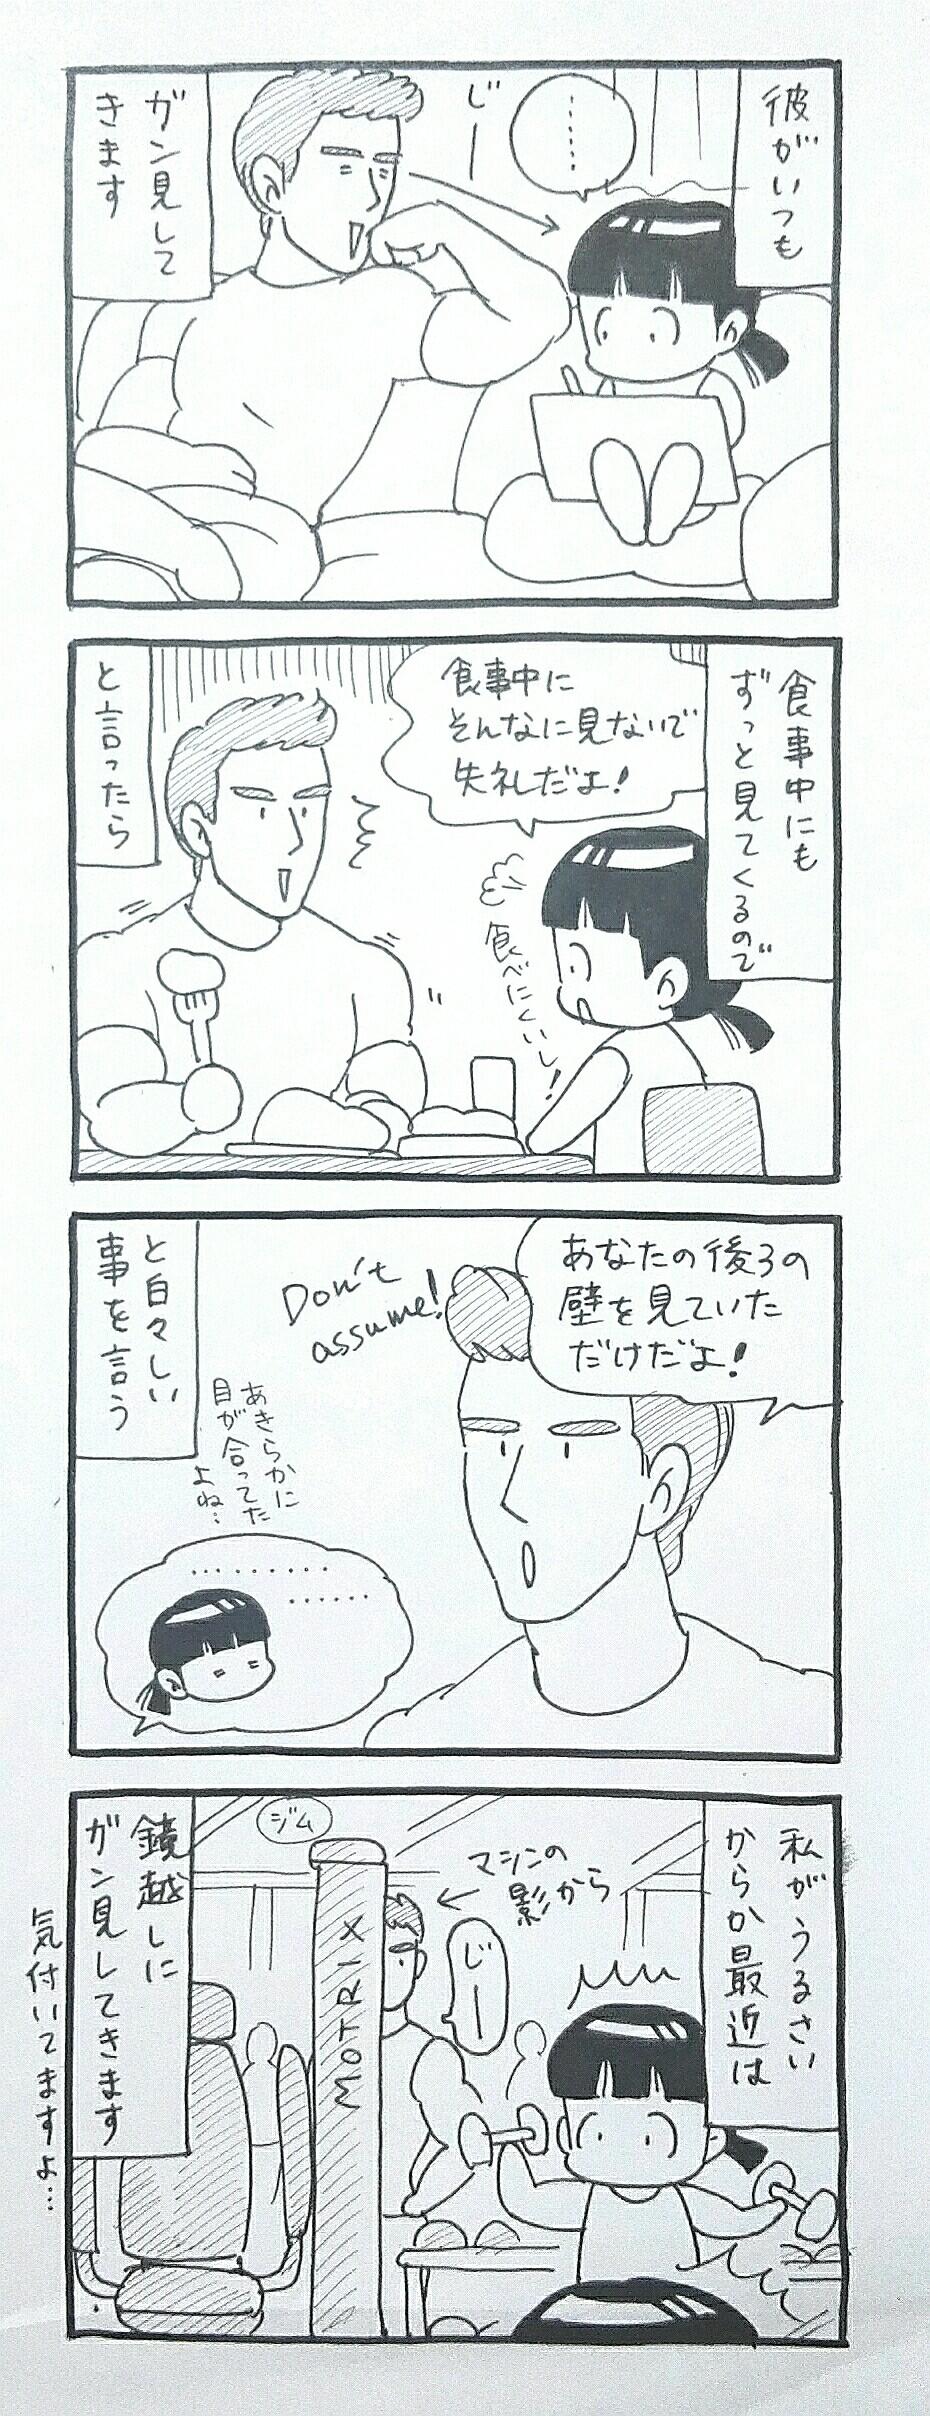 f:id:Shoko_drawing:20190612215446j:plain